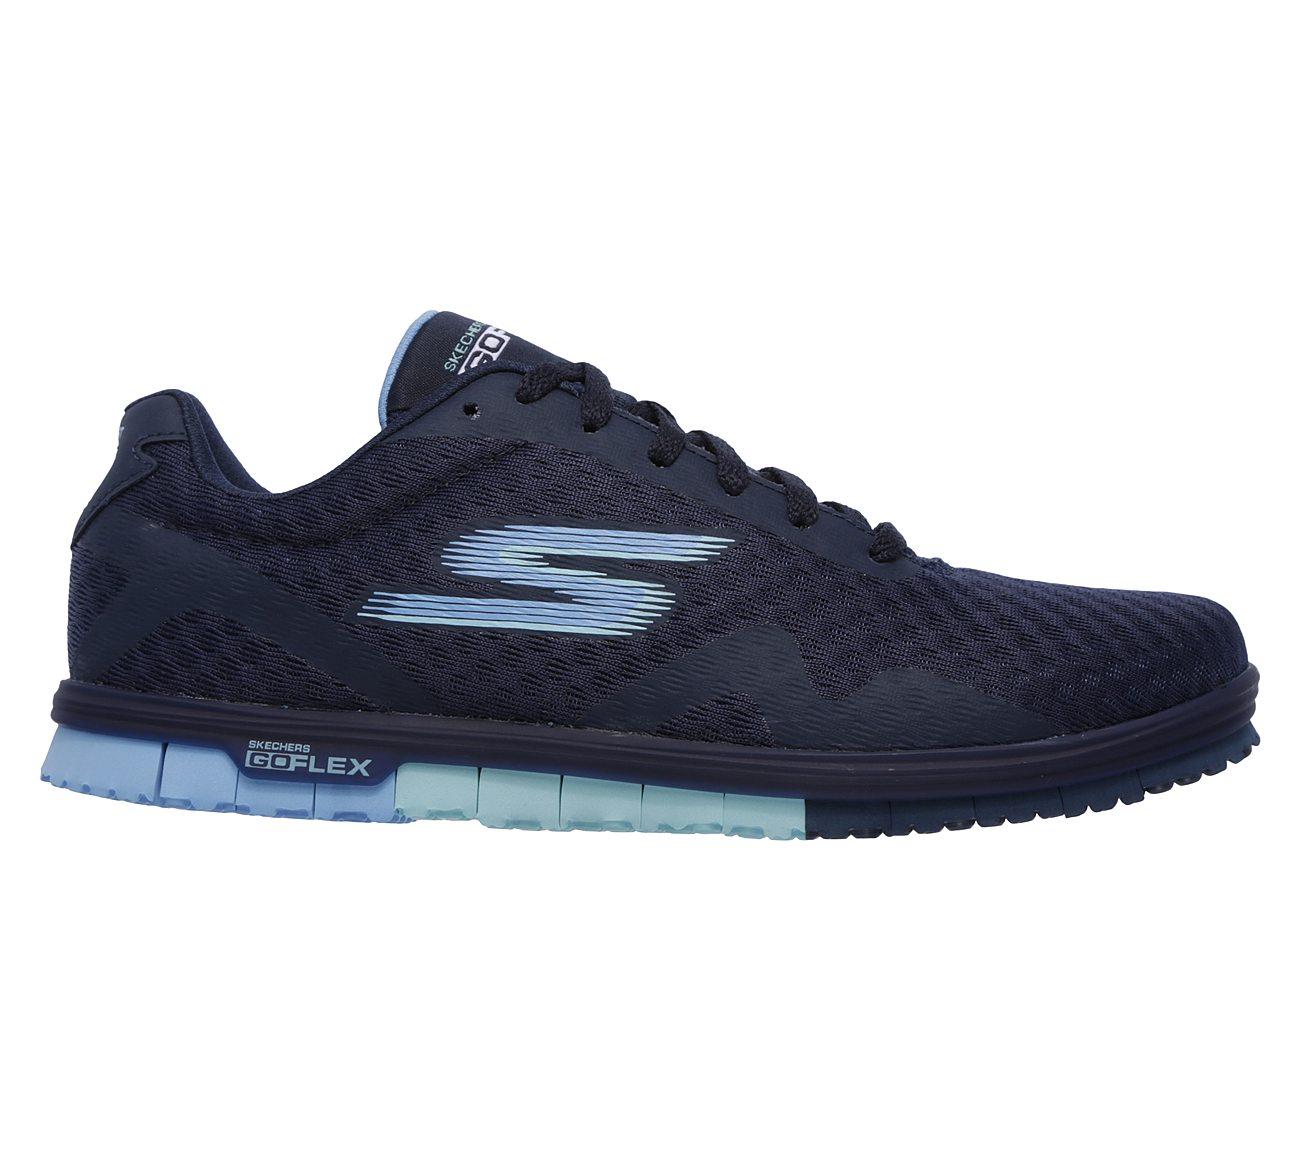 Skechers Go Mini Flex - Speedy Grey Running Shoes pre order online rzJNm